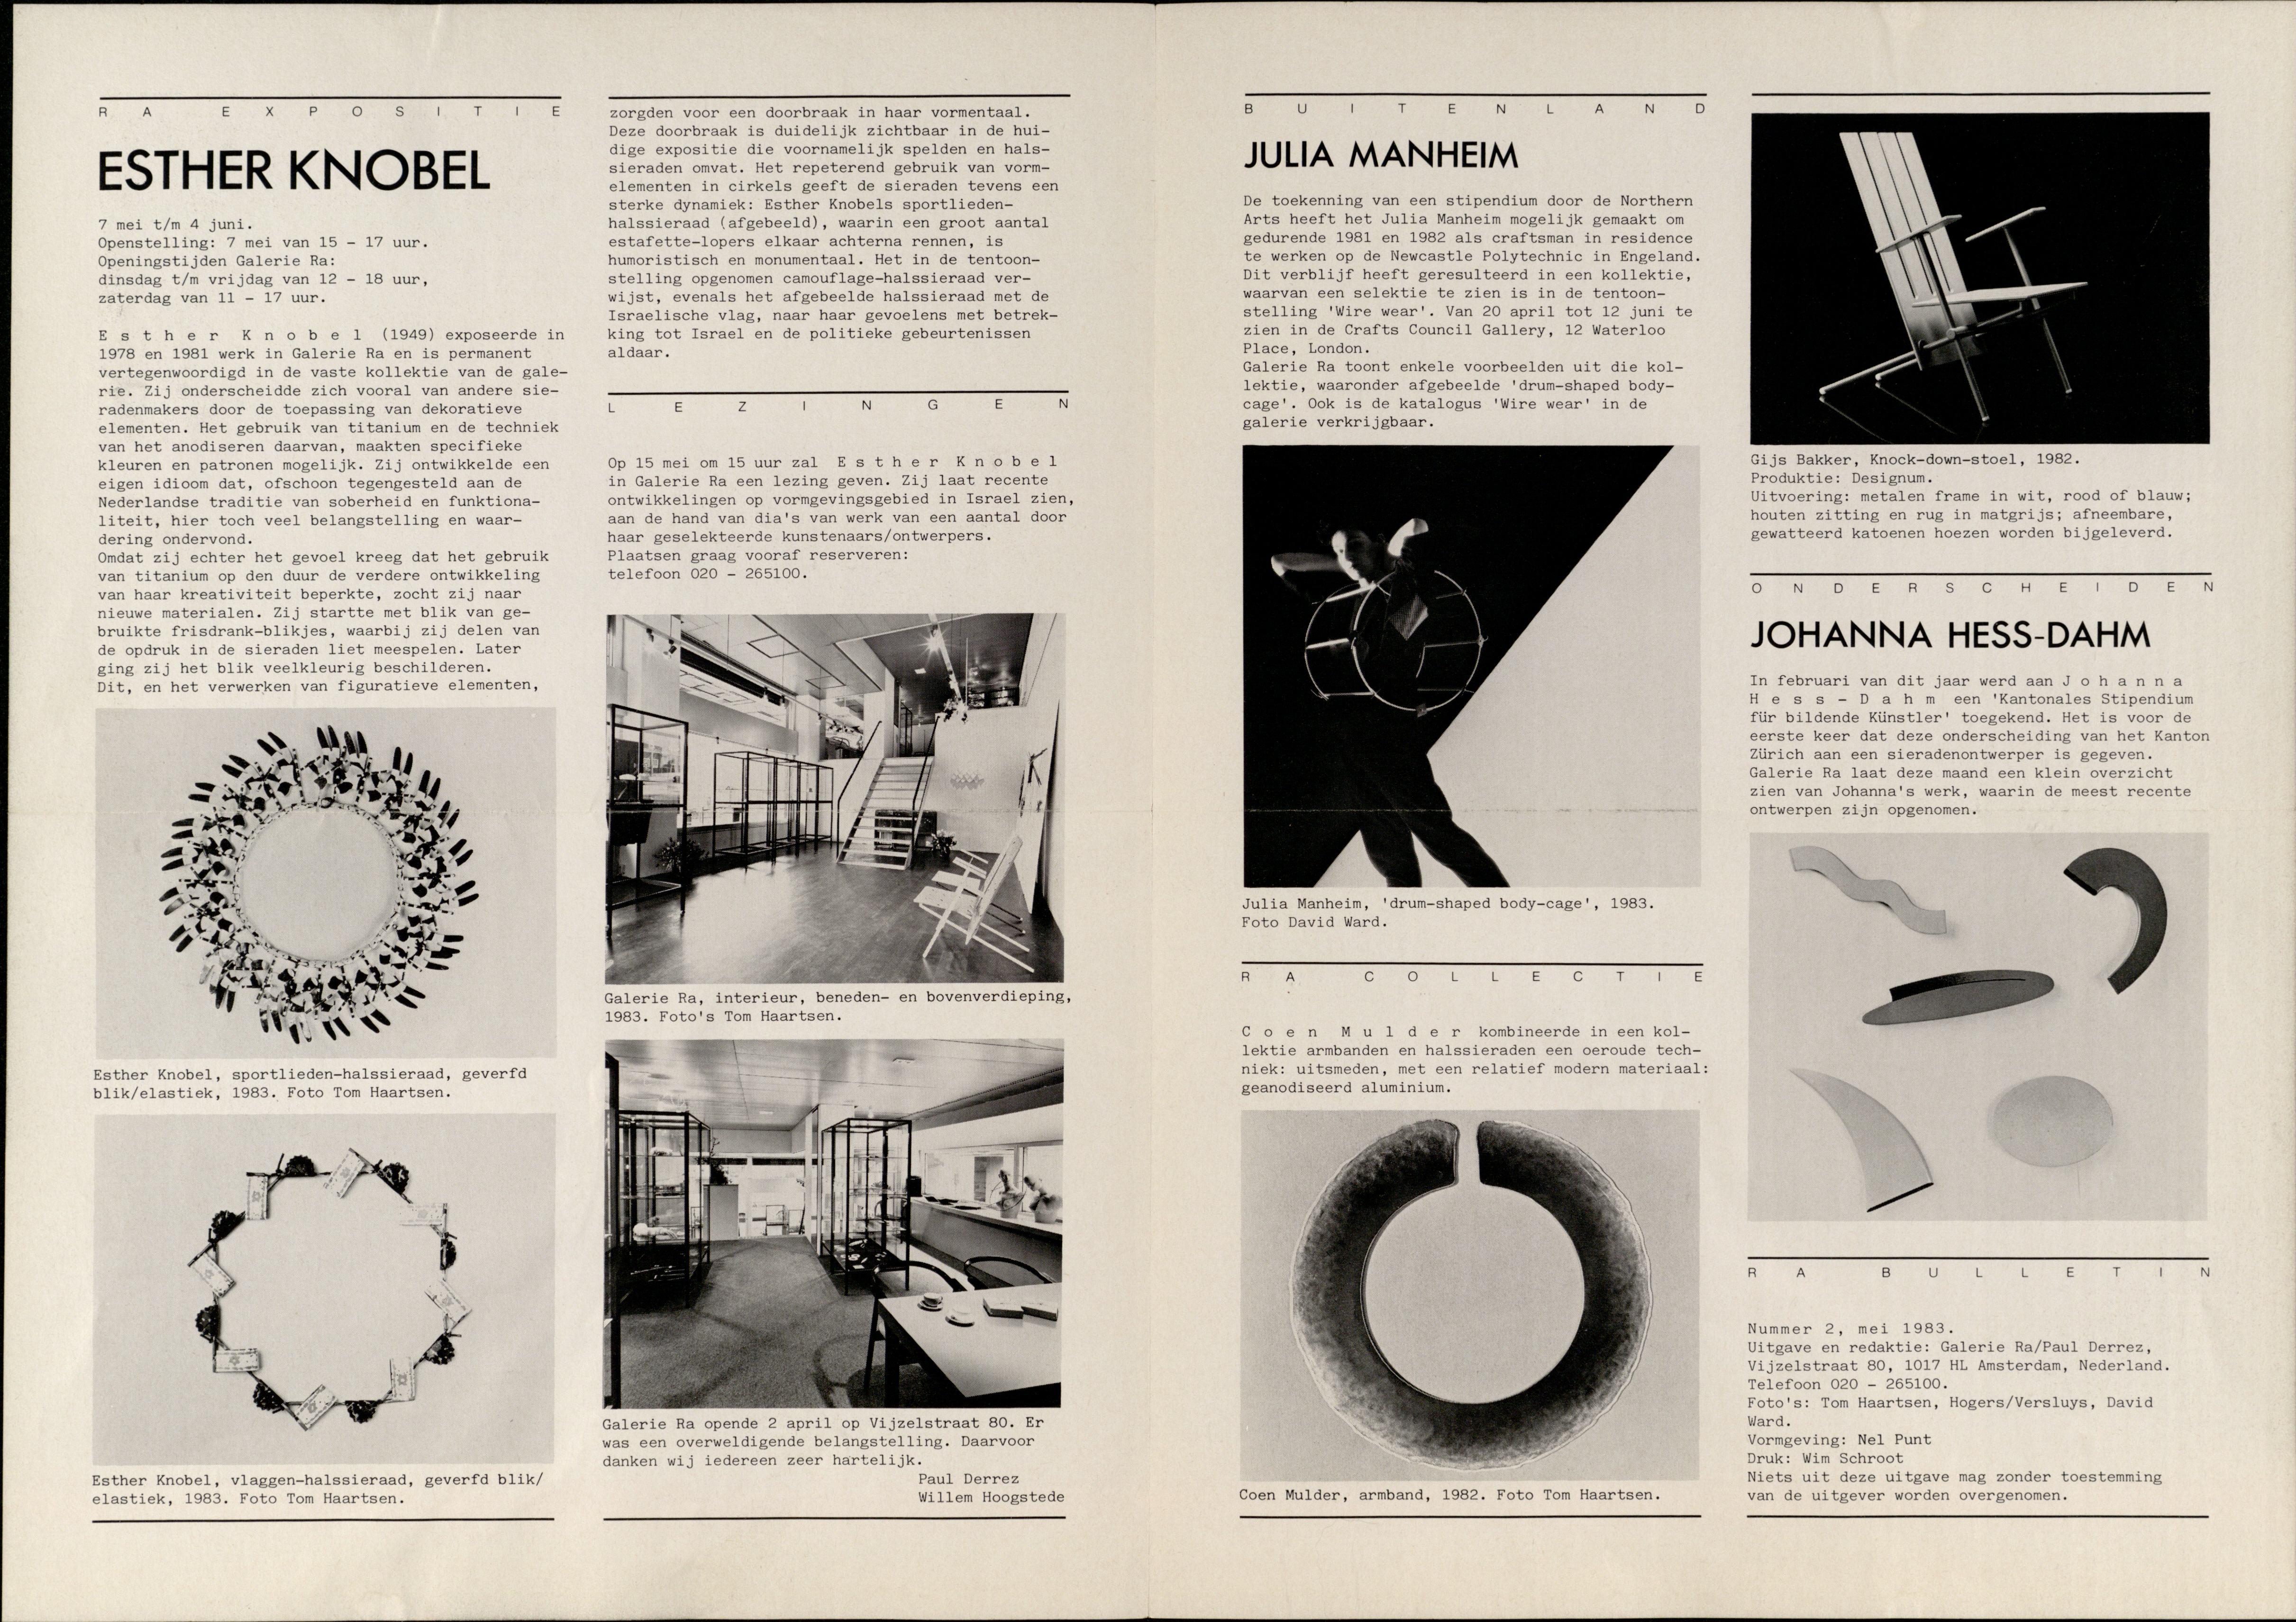 Ra Bulletin 2, mei 1983, achterzijde met tekst en foto's Tom Haartsen, David Ward, drukwerk, papier, Esther Knobel, Julia Manheim, Johanna Dahm, Gijs Bakker